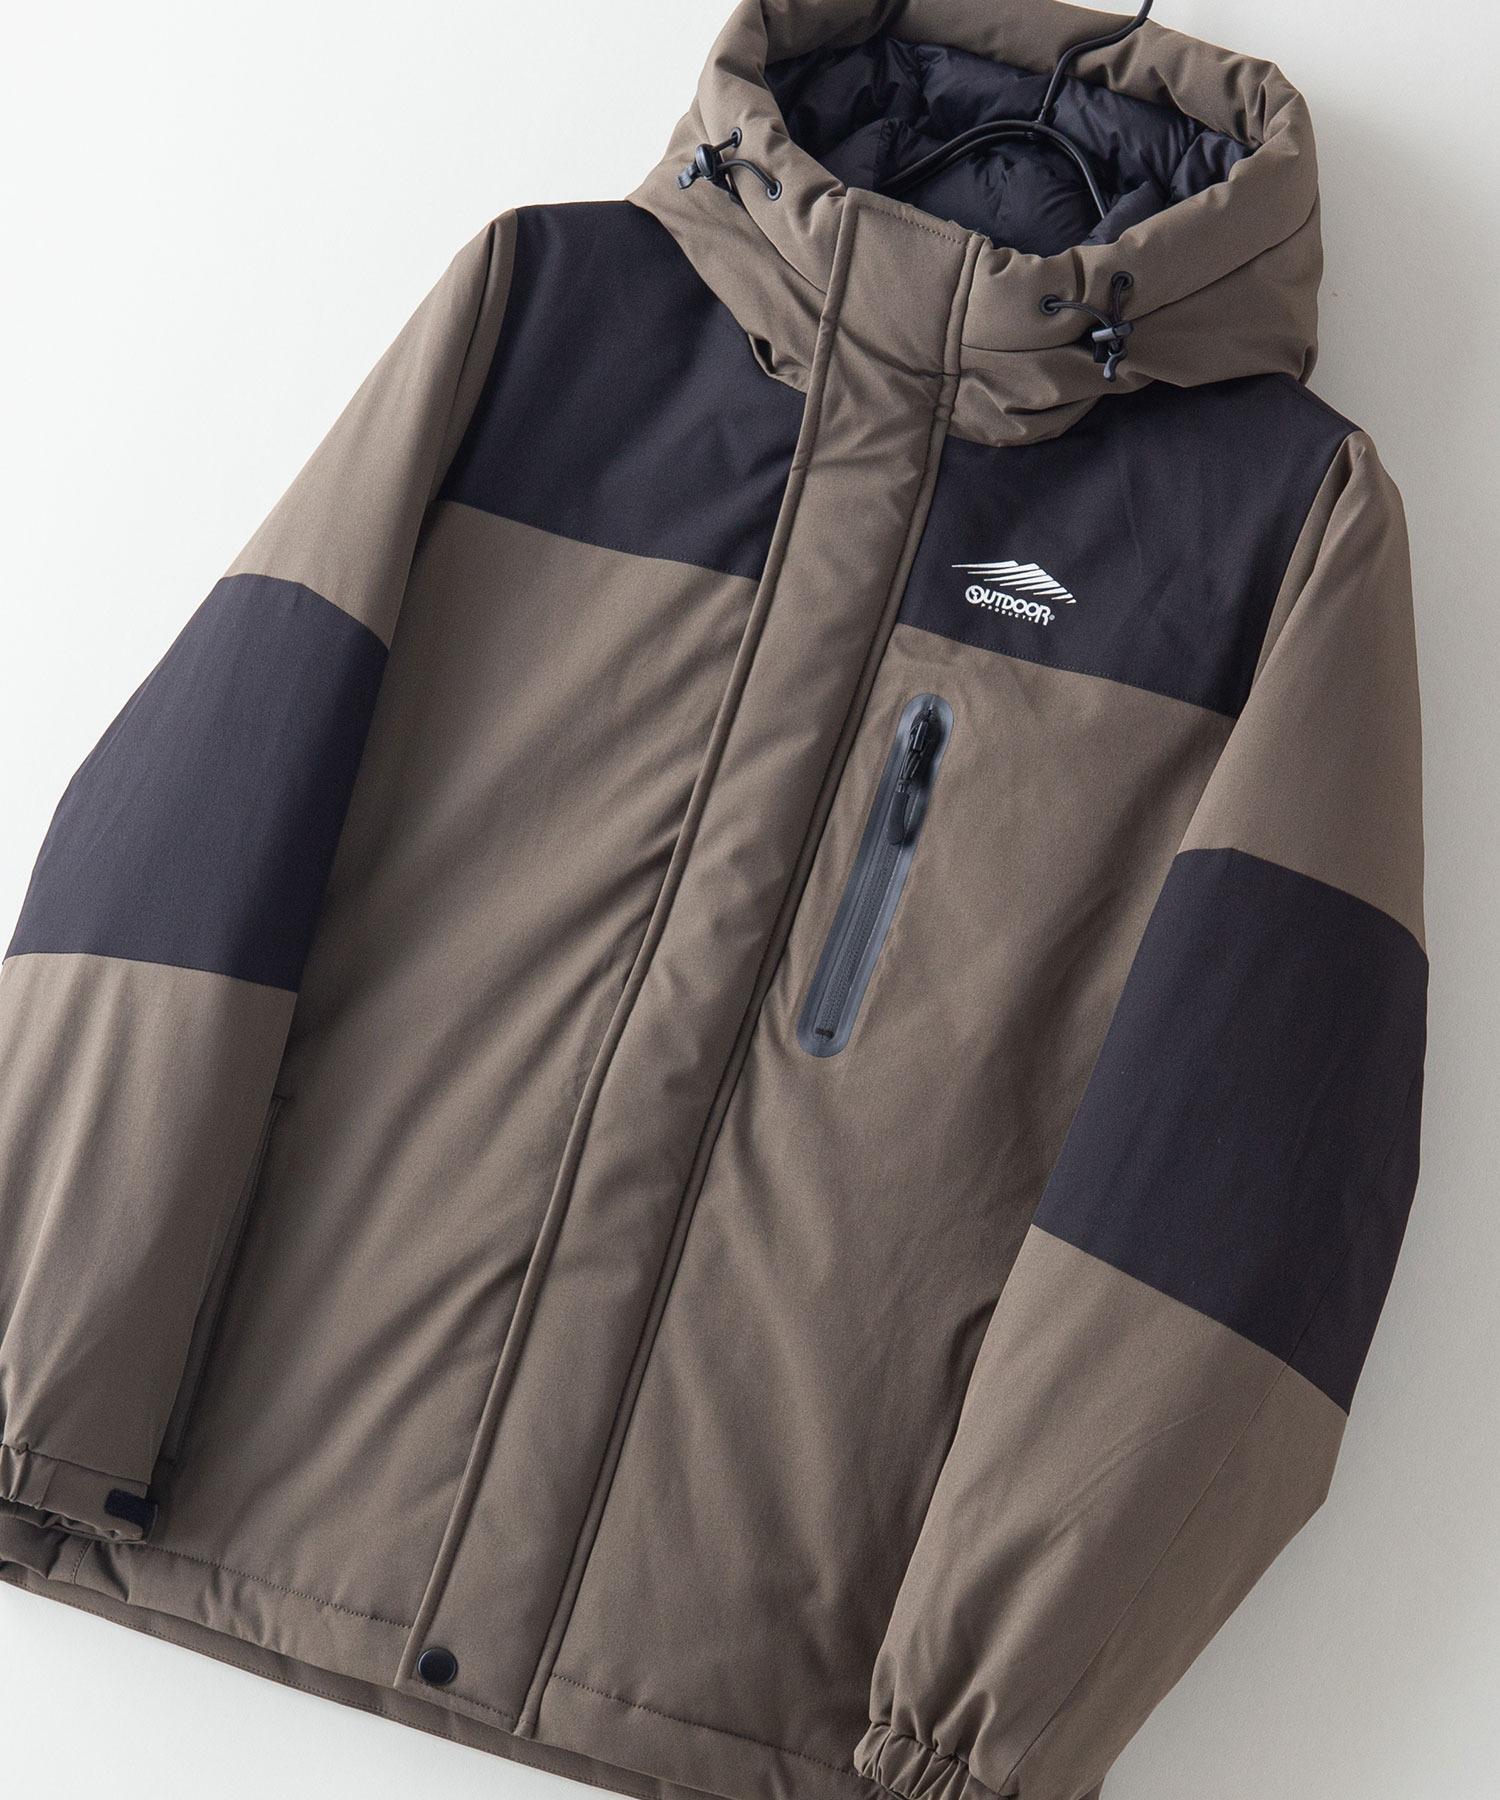 KIDS(キッズ)切替中綿フードジャケット 撥水防風ストレッチ耐水圧10000mm